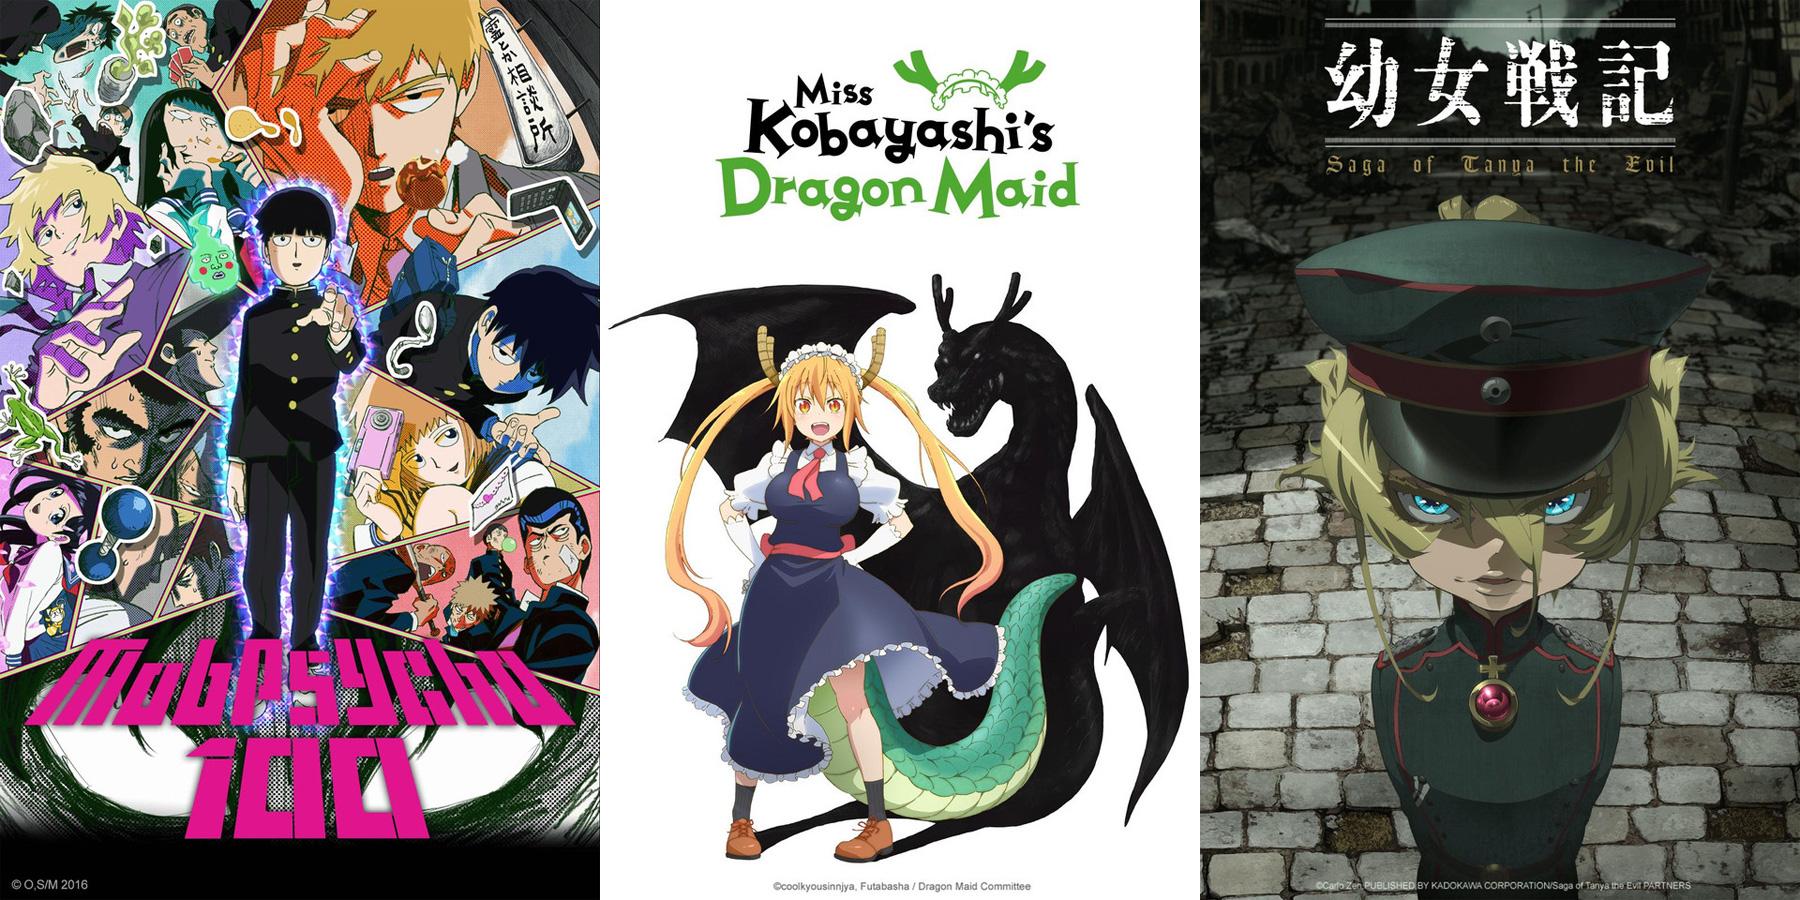 Mob Psycho 100, Miss Kobayashi's Dragon Maid und Saga of Tanya the Evi